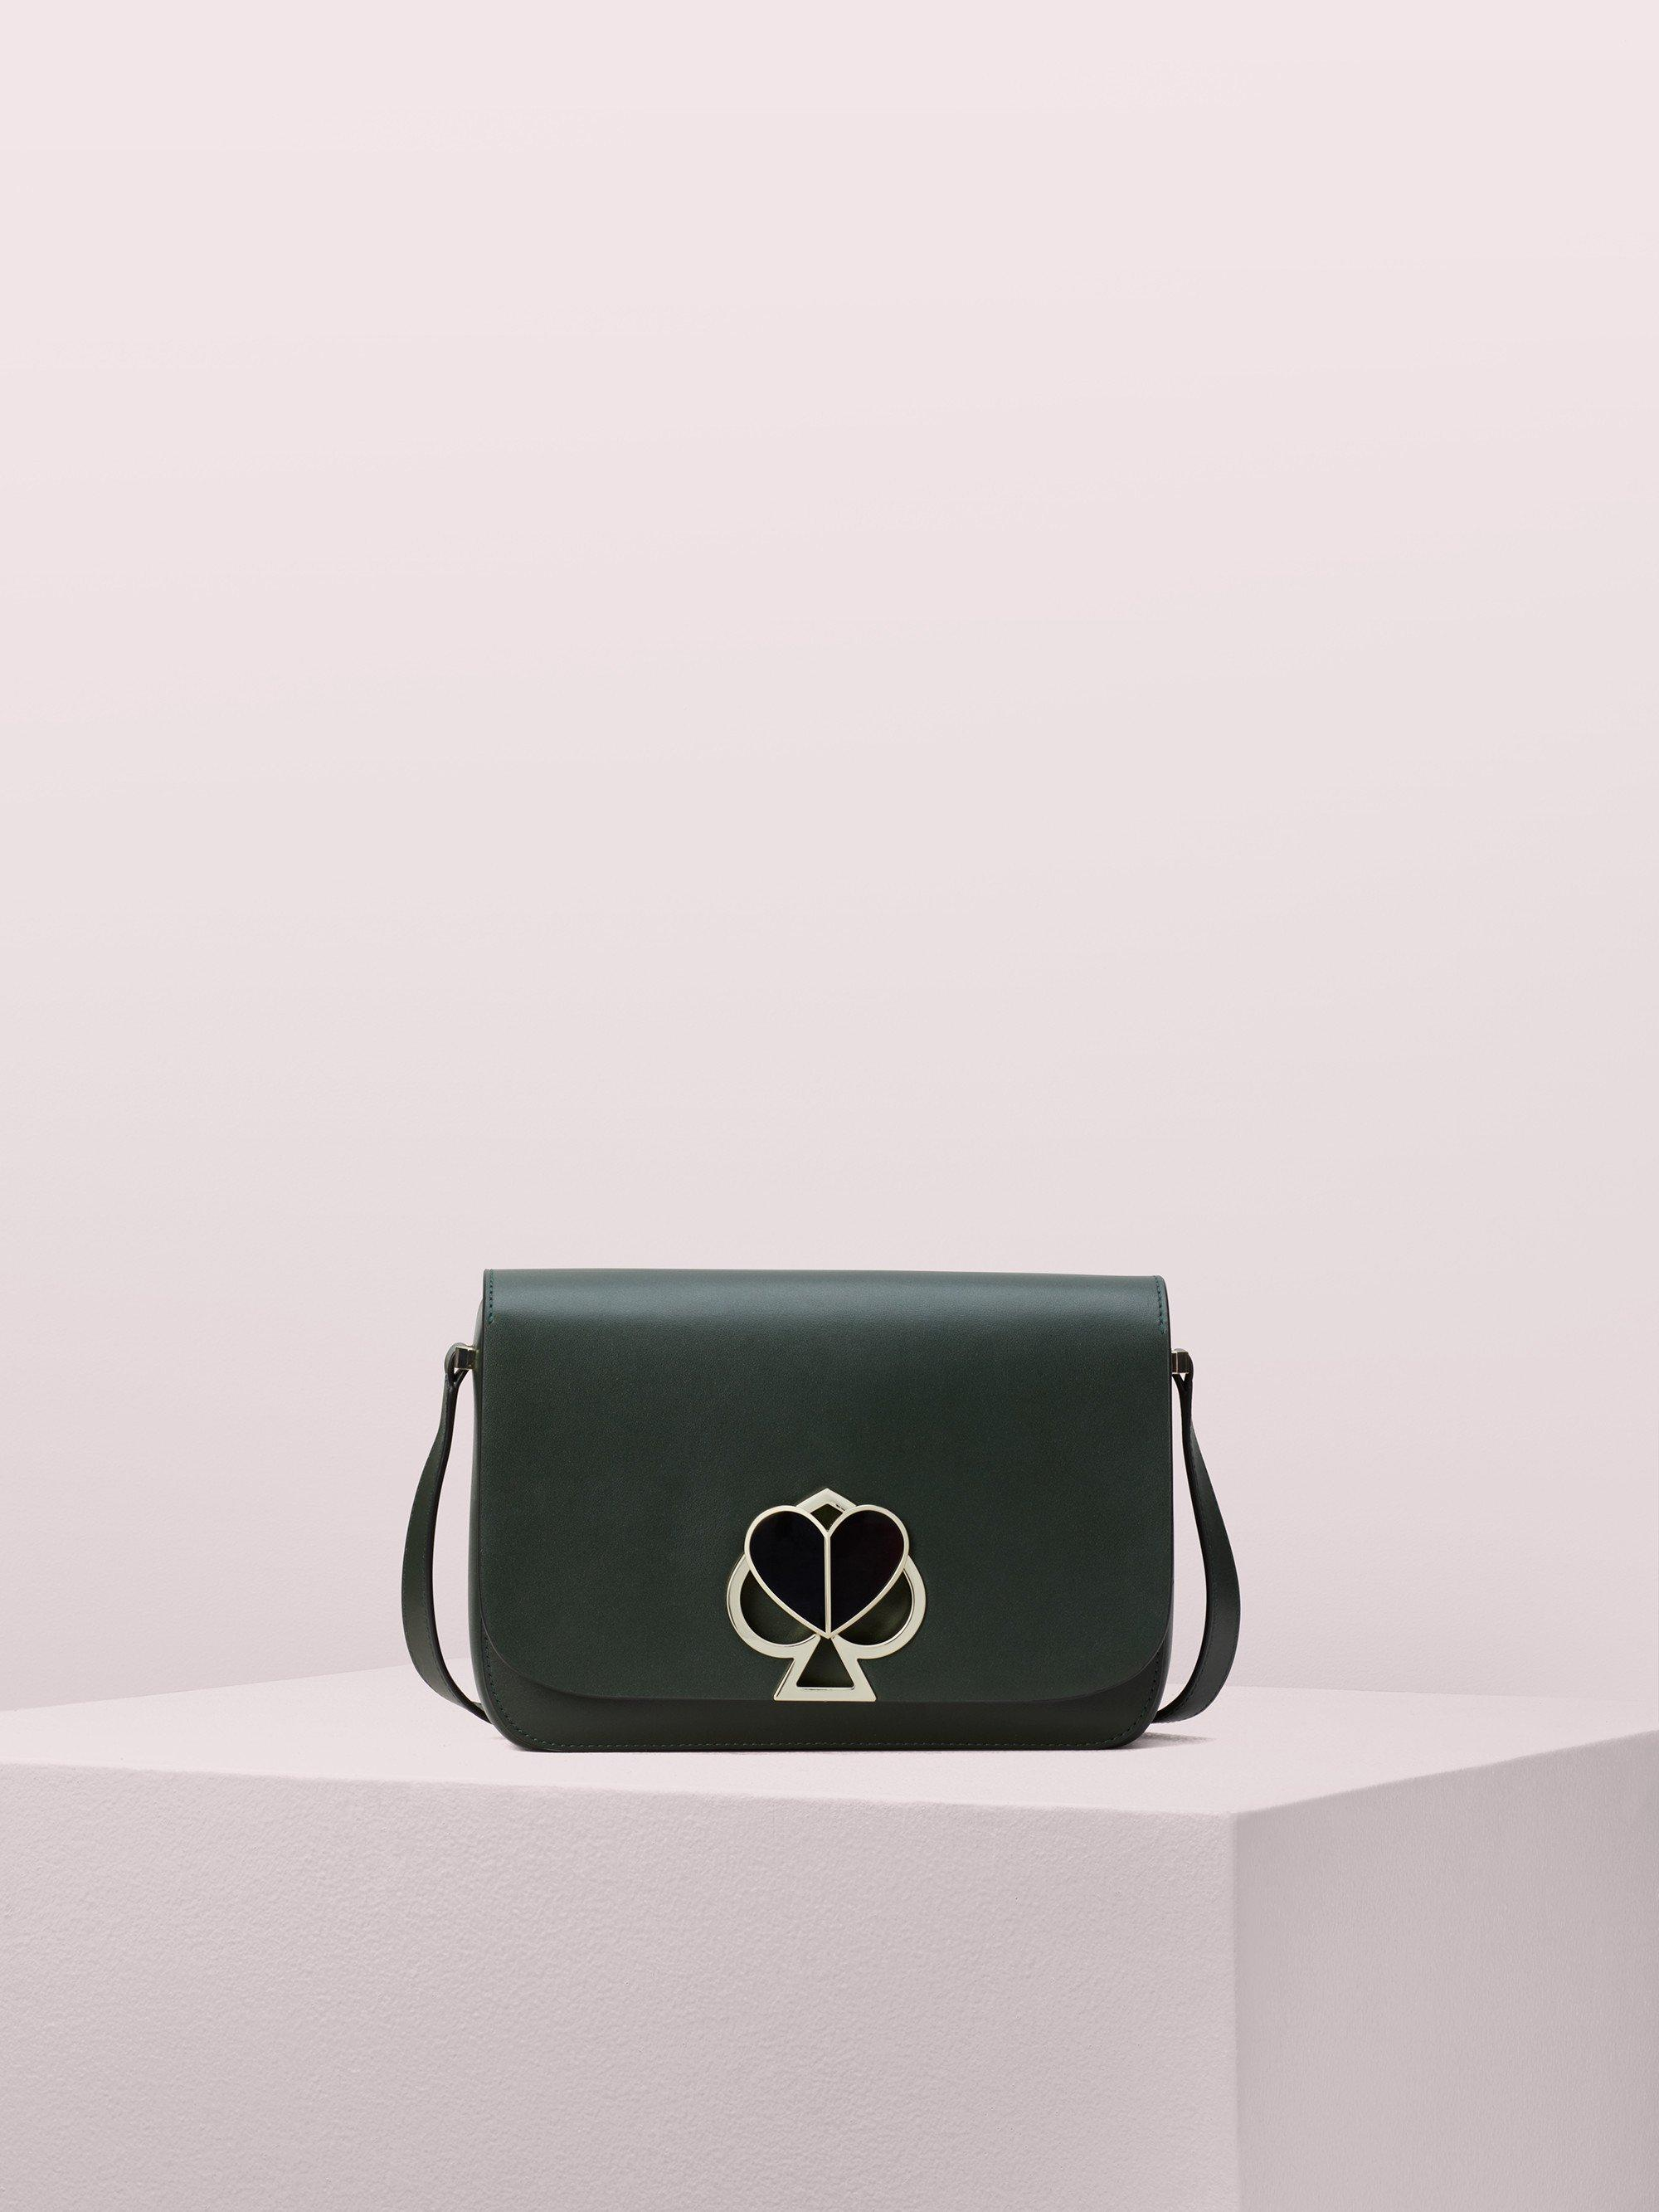 78f13c0e7d12 Kate Spade Nicola Twistlock Medium Shoulder Bag in Green - Lyst